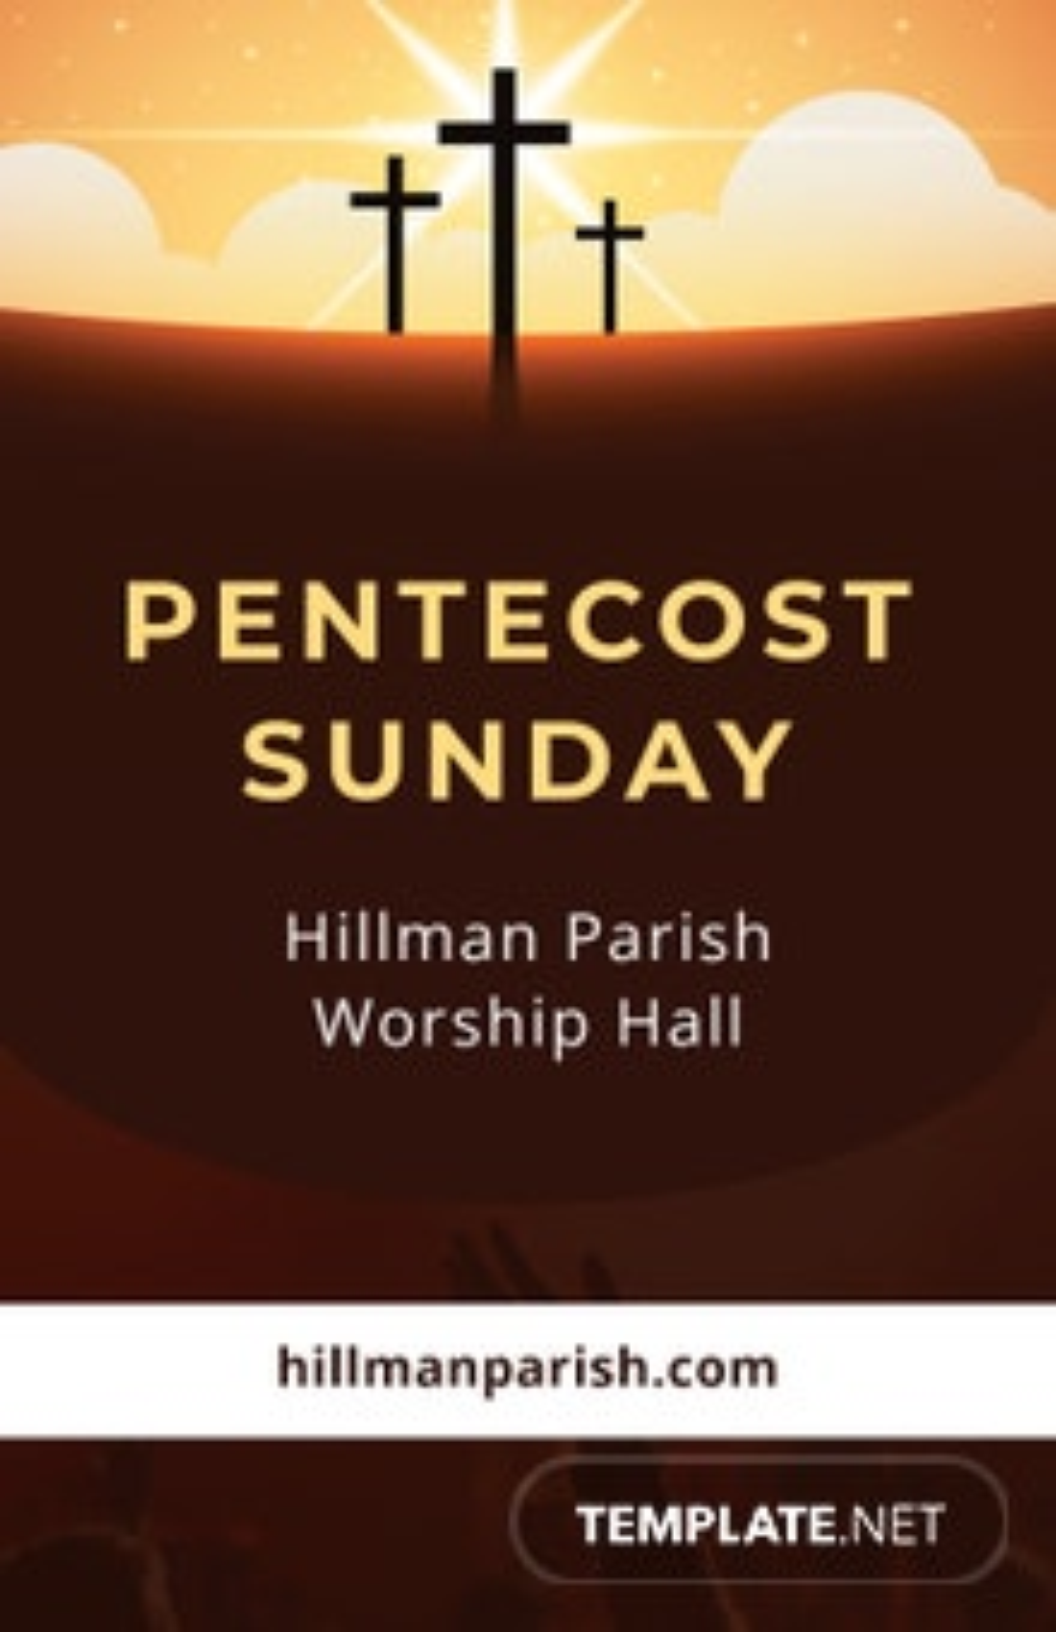 Free Pentecost Sunday Poster Template